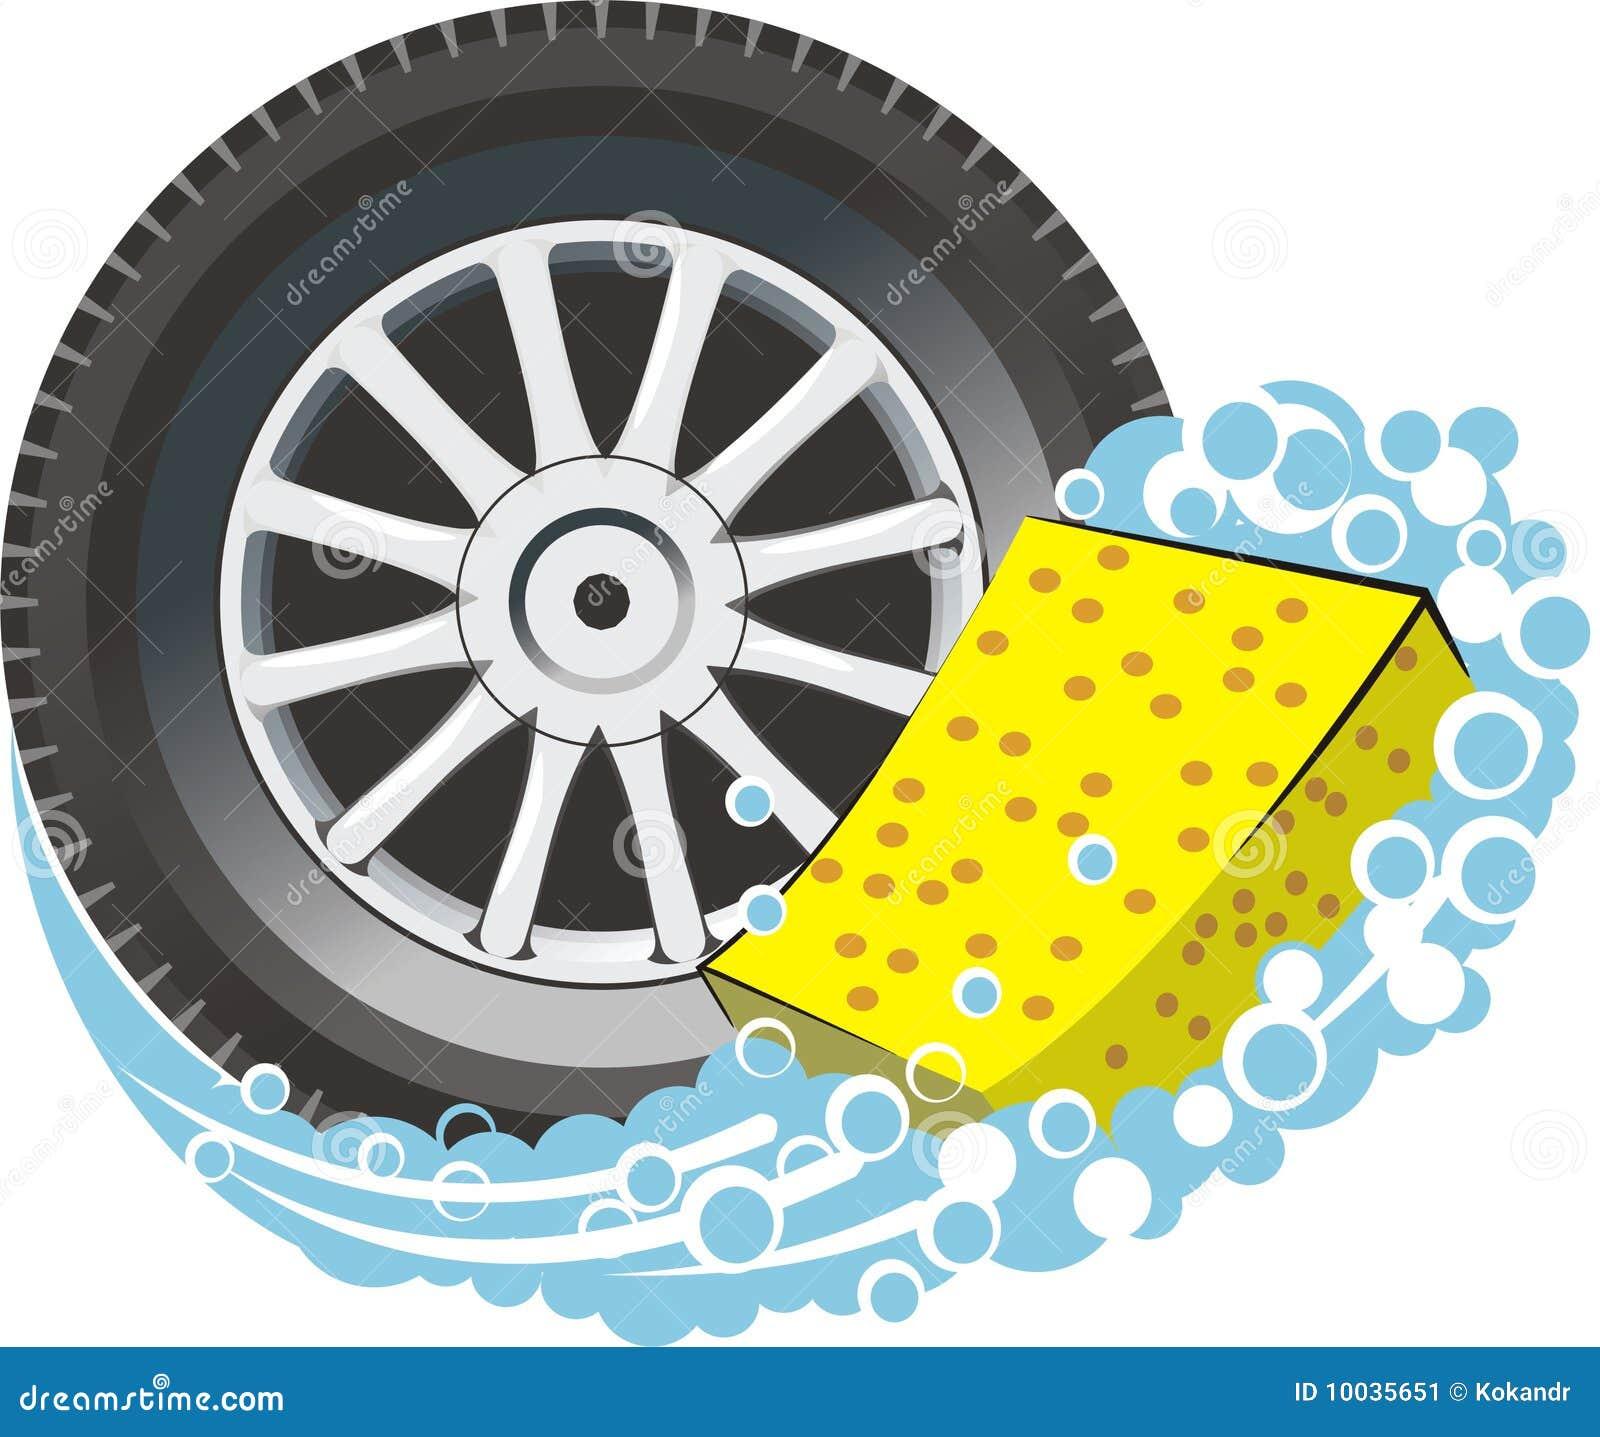 Car tire with sponge